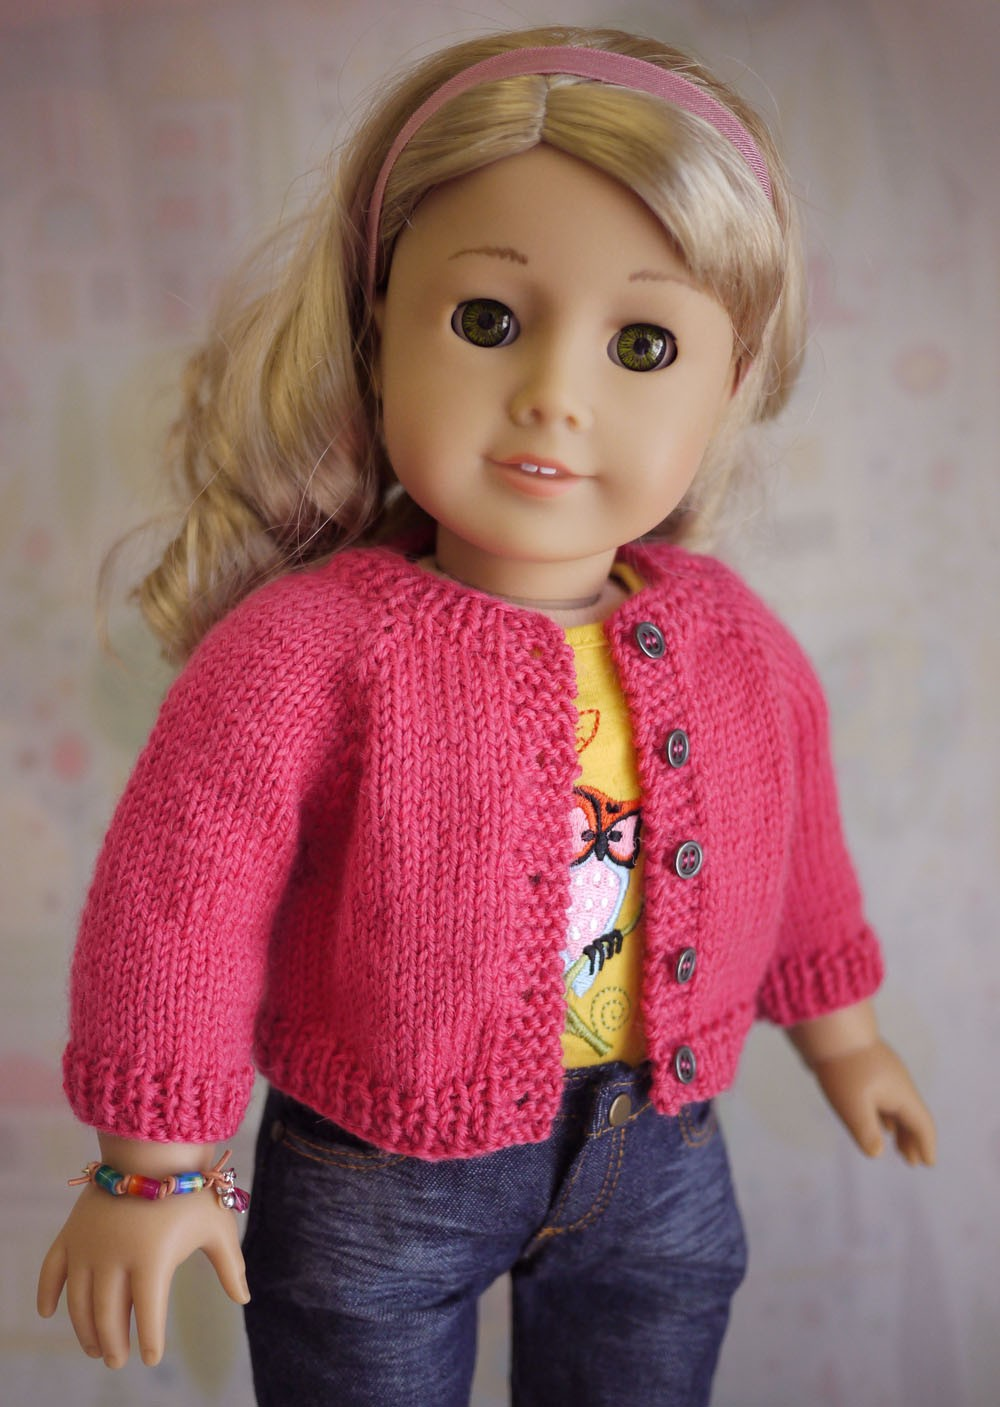 Knitting Patterns for American Girl Dolls A Knitting Blog